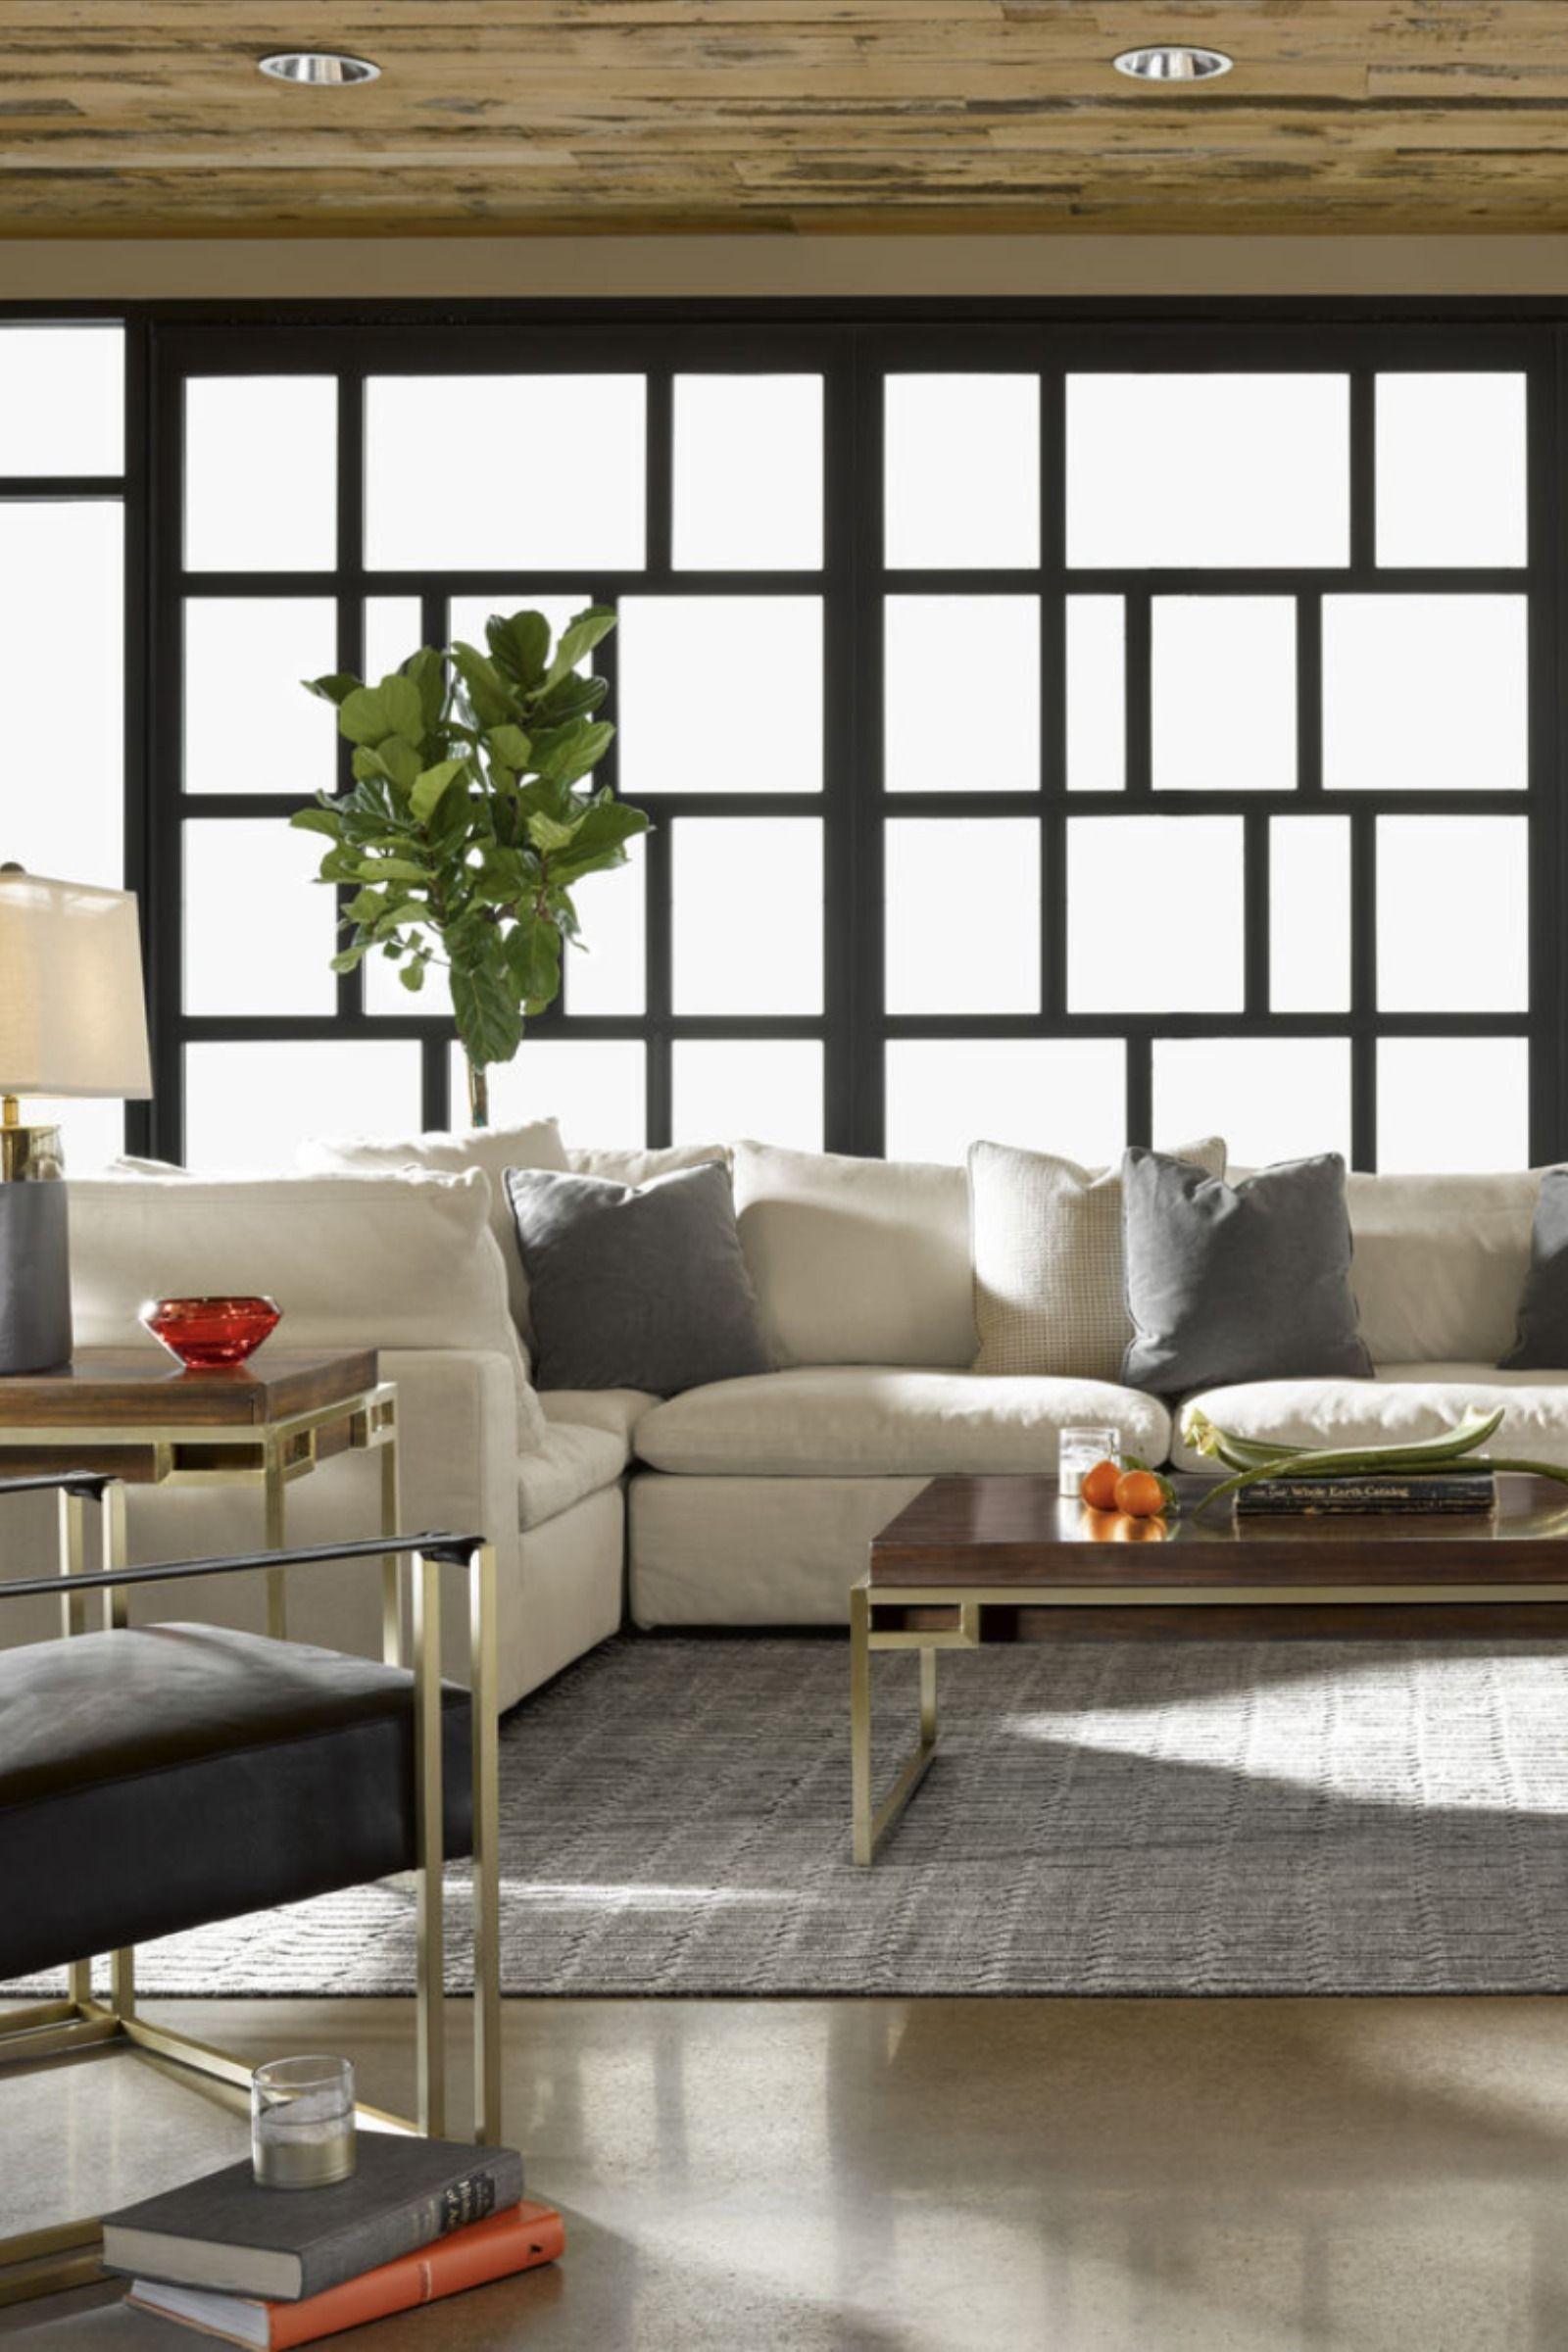 Palmer Sectional 4 Piece Universal Furniture Furniture Living Room Designs [ 2400 x 1600 Pixel ]